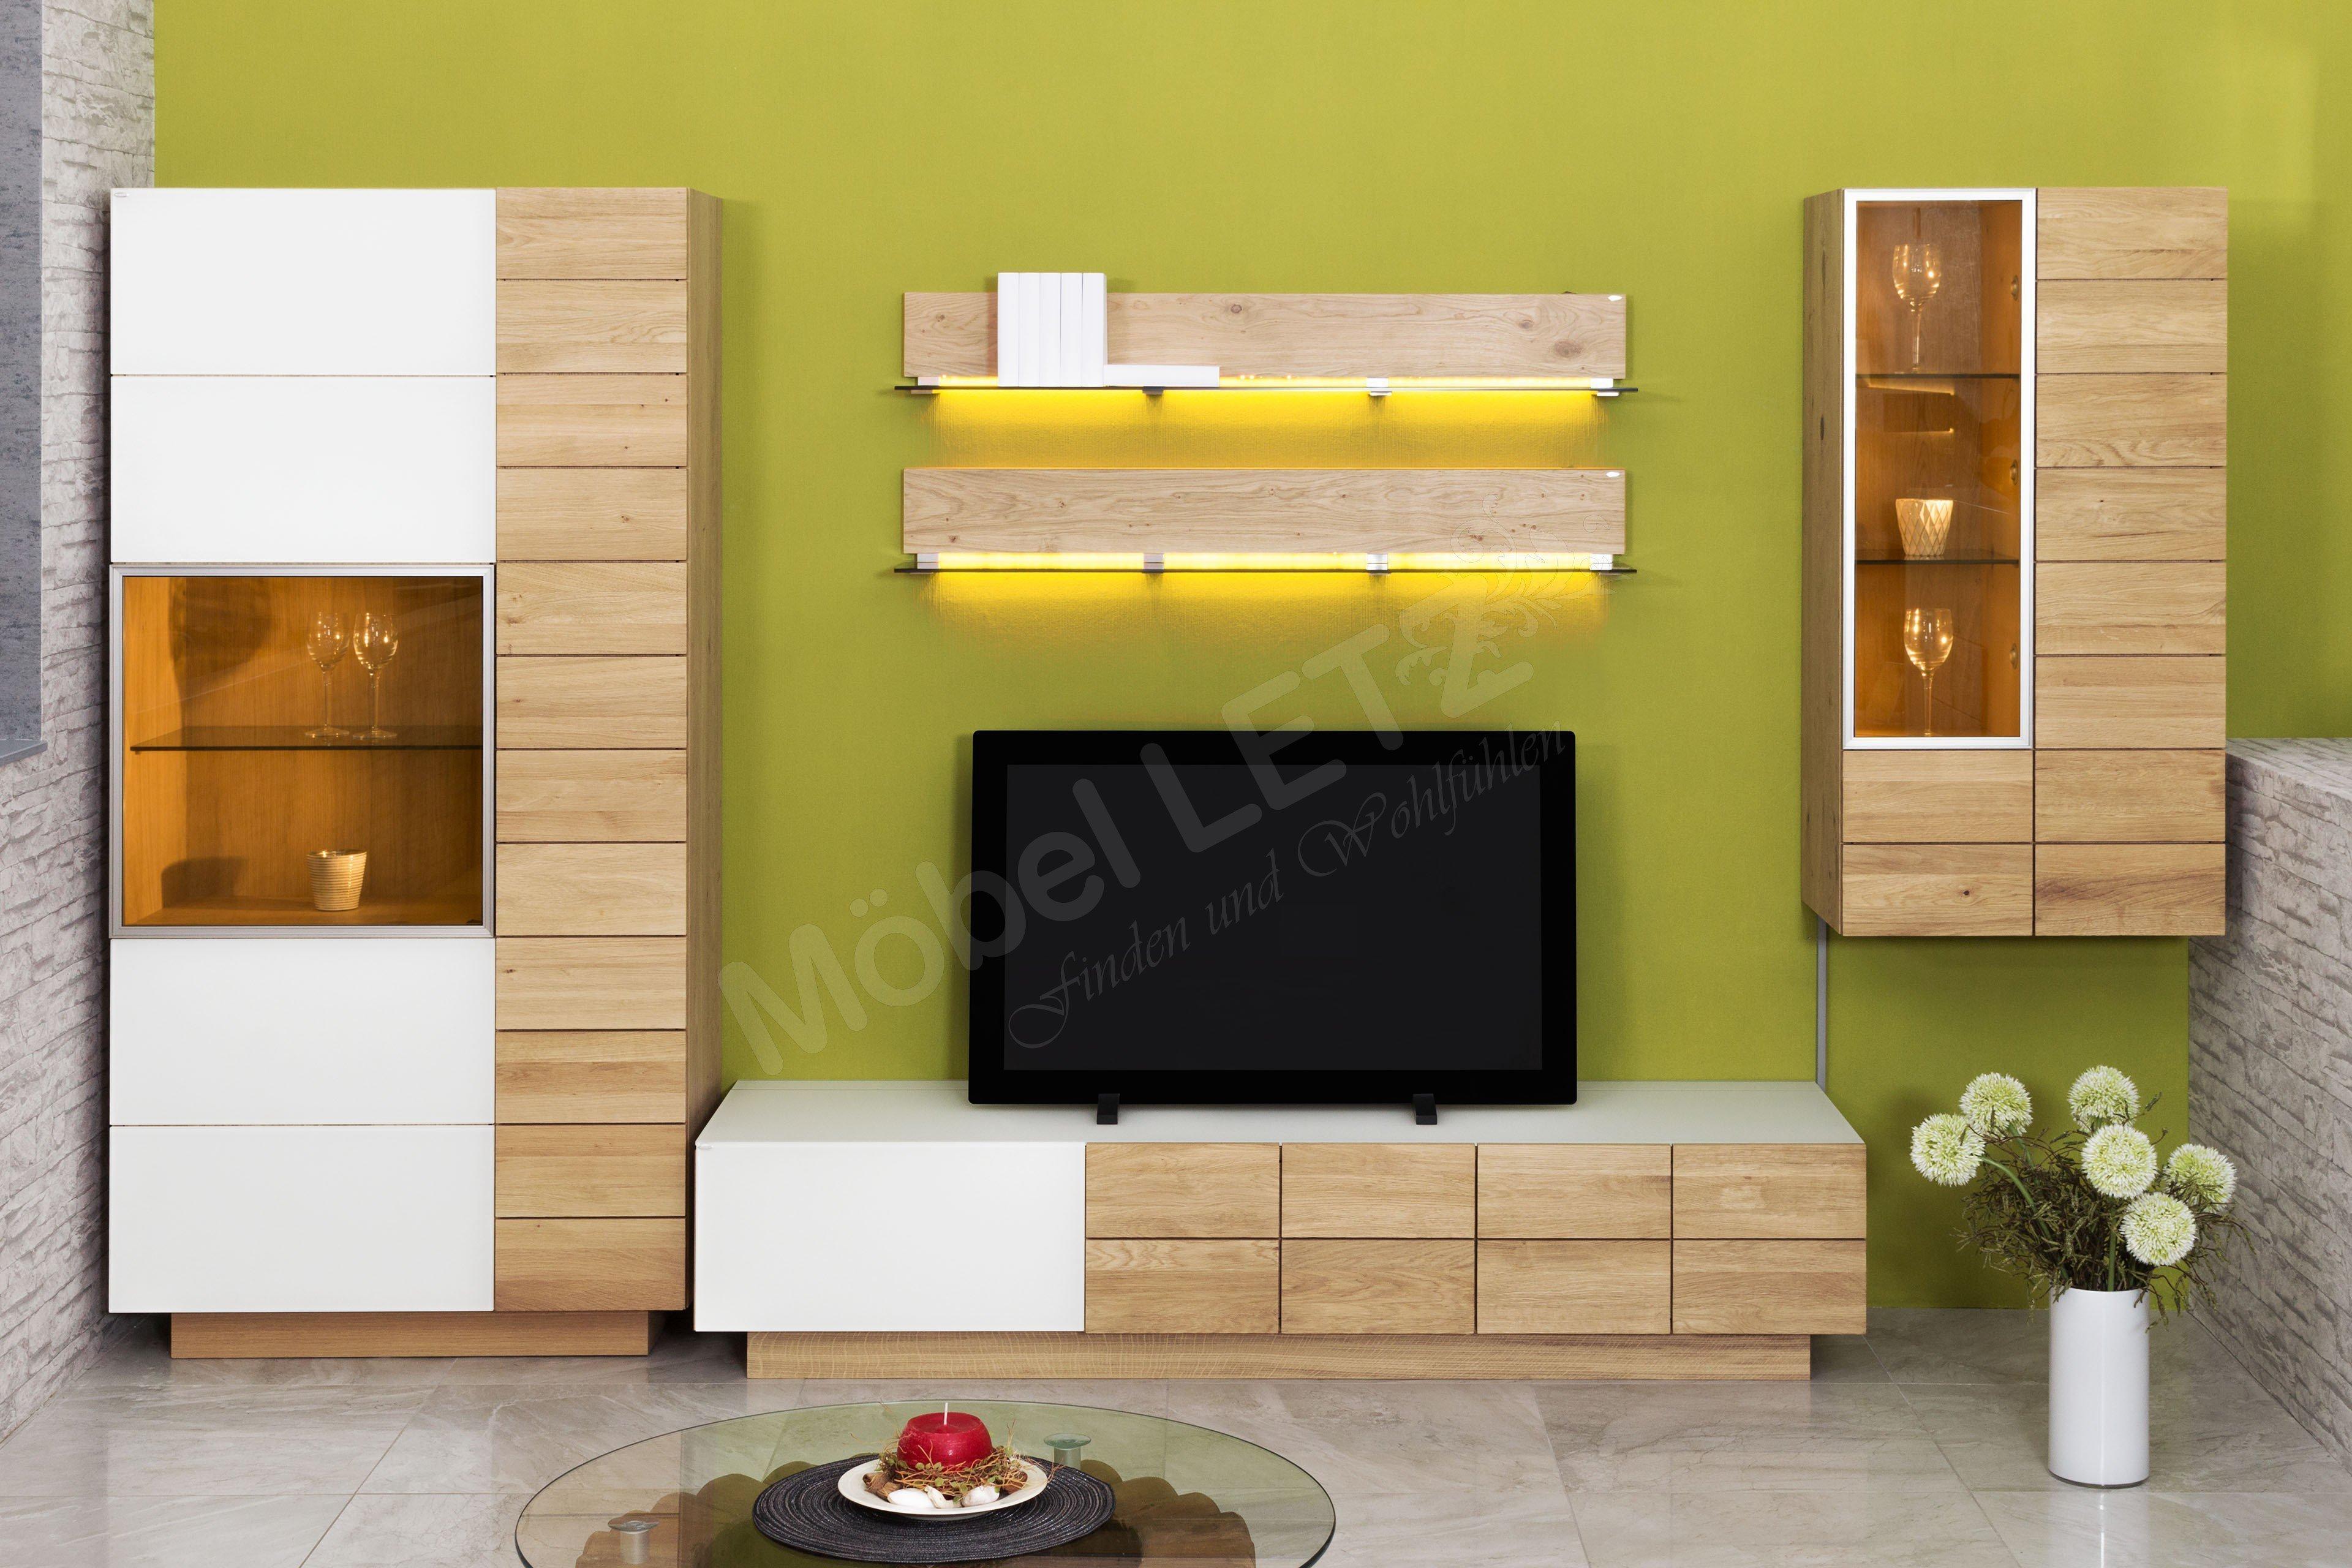 voglauer wohnwand v montana mit beleuchtung m bel letz. Black Bedroom Furniture Sets. Home Design Ideas